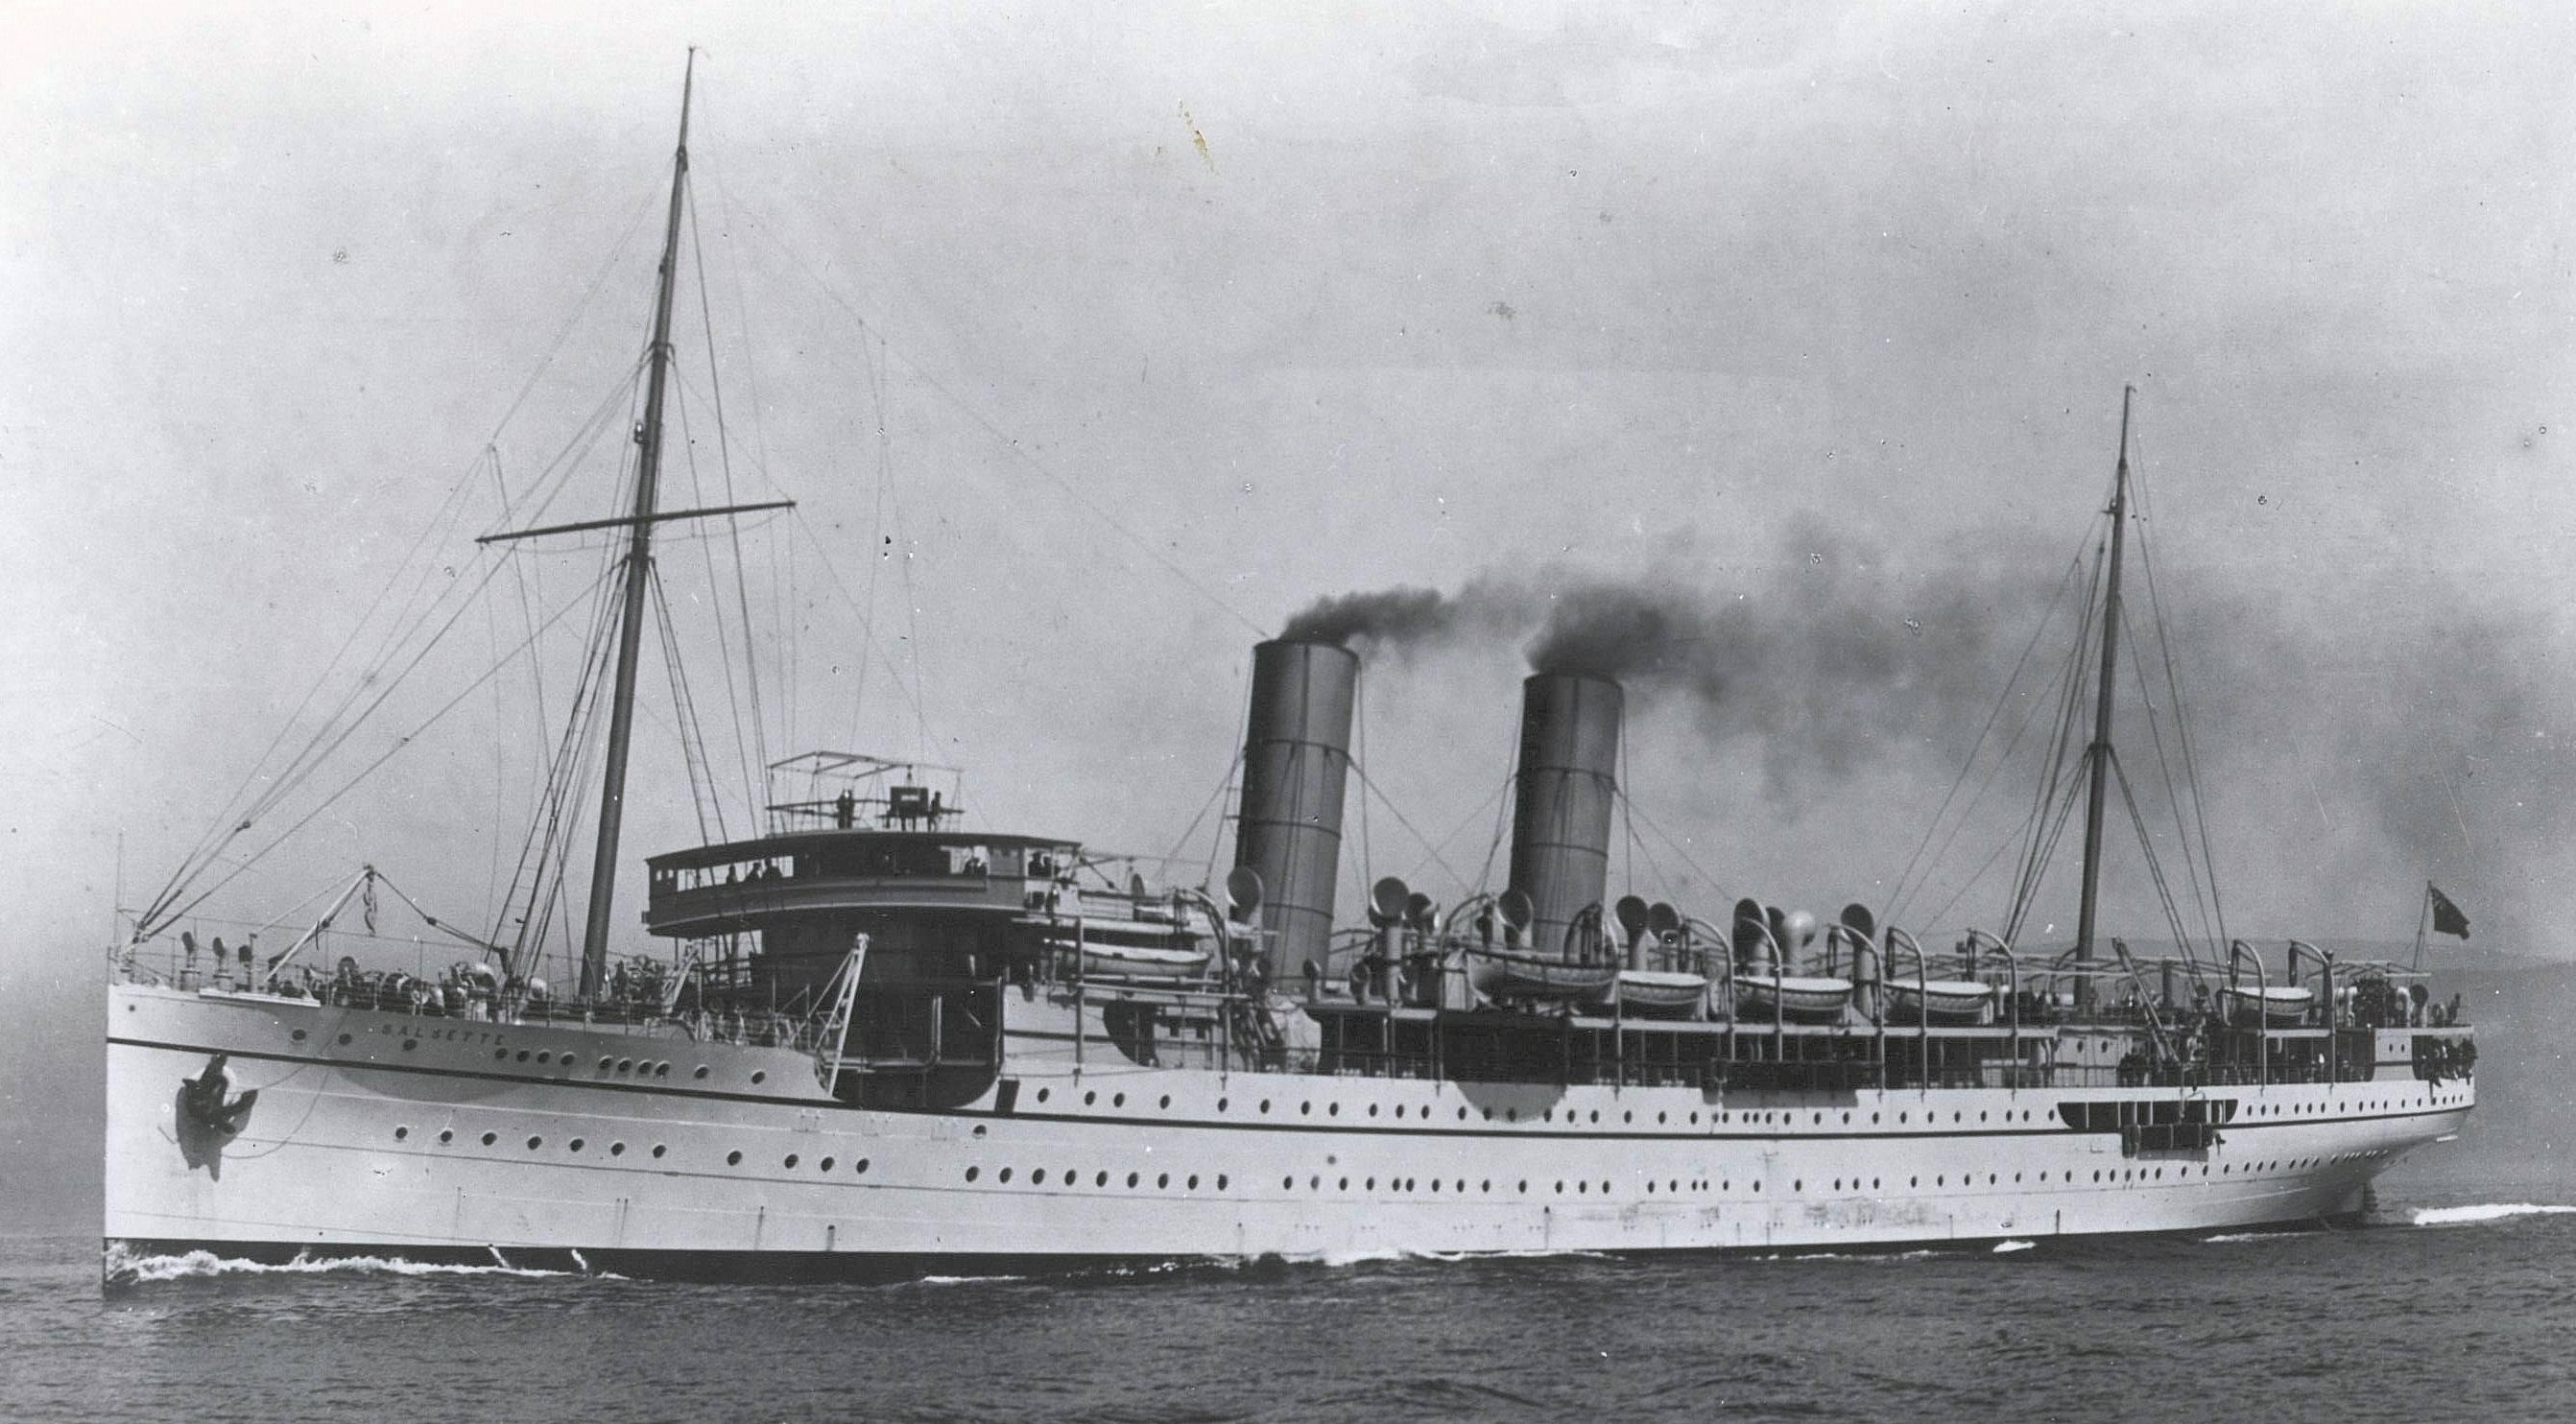 Salsette, SS image